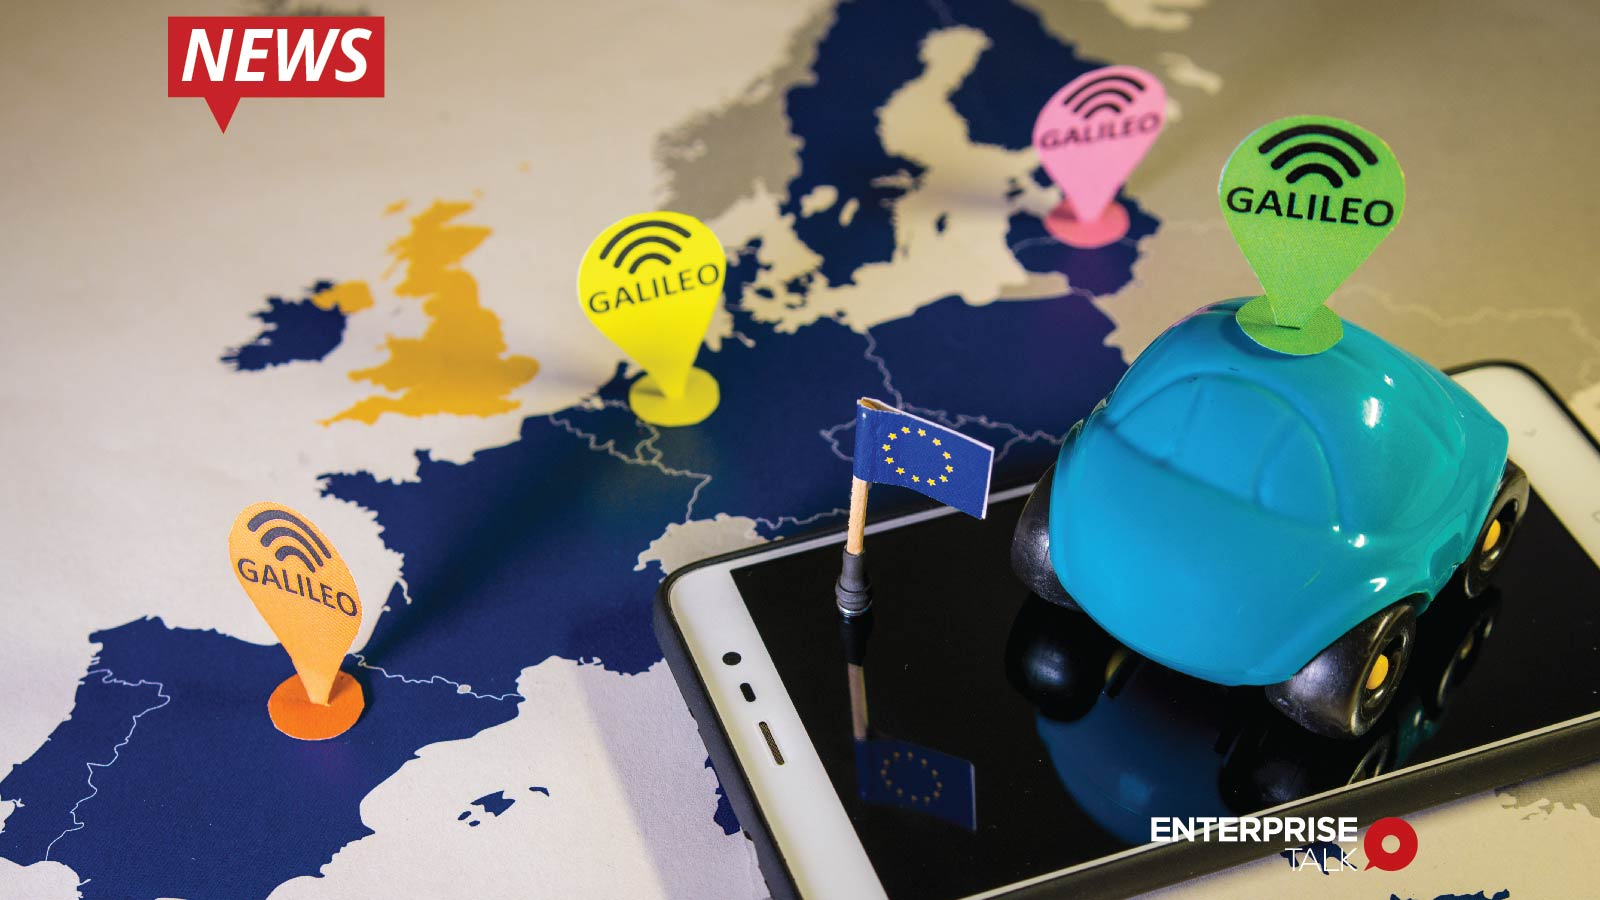 Orolia provides solutions for the EU's Galileo satellite navigation system for European defense